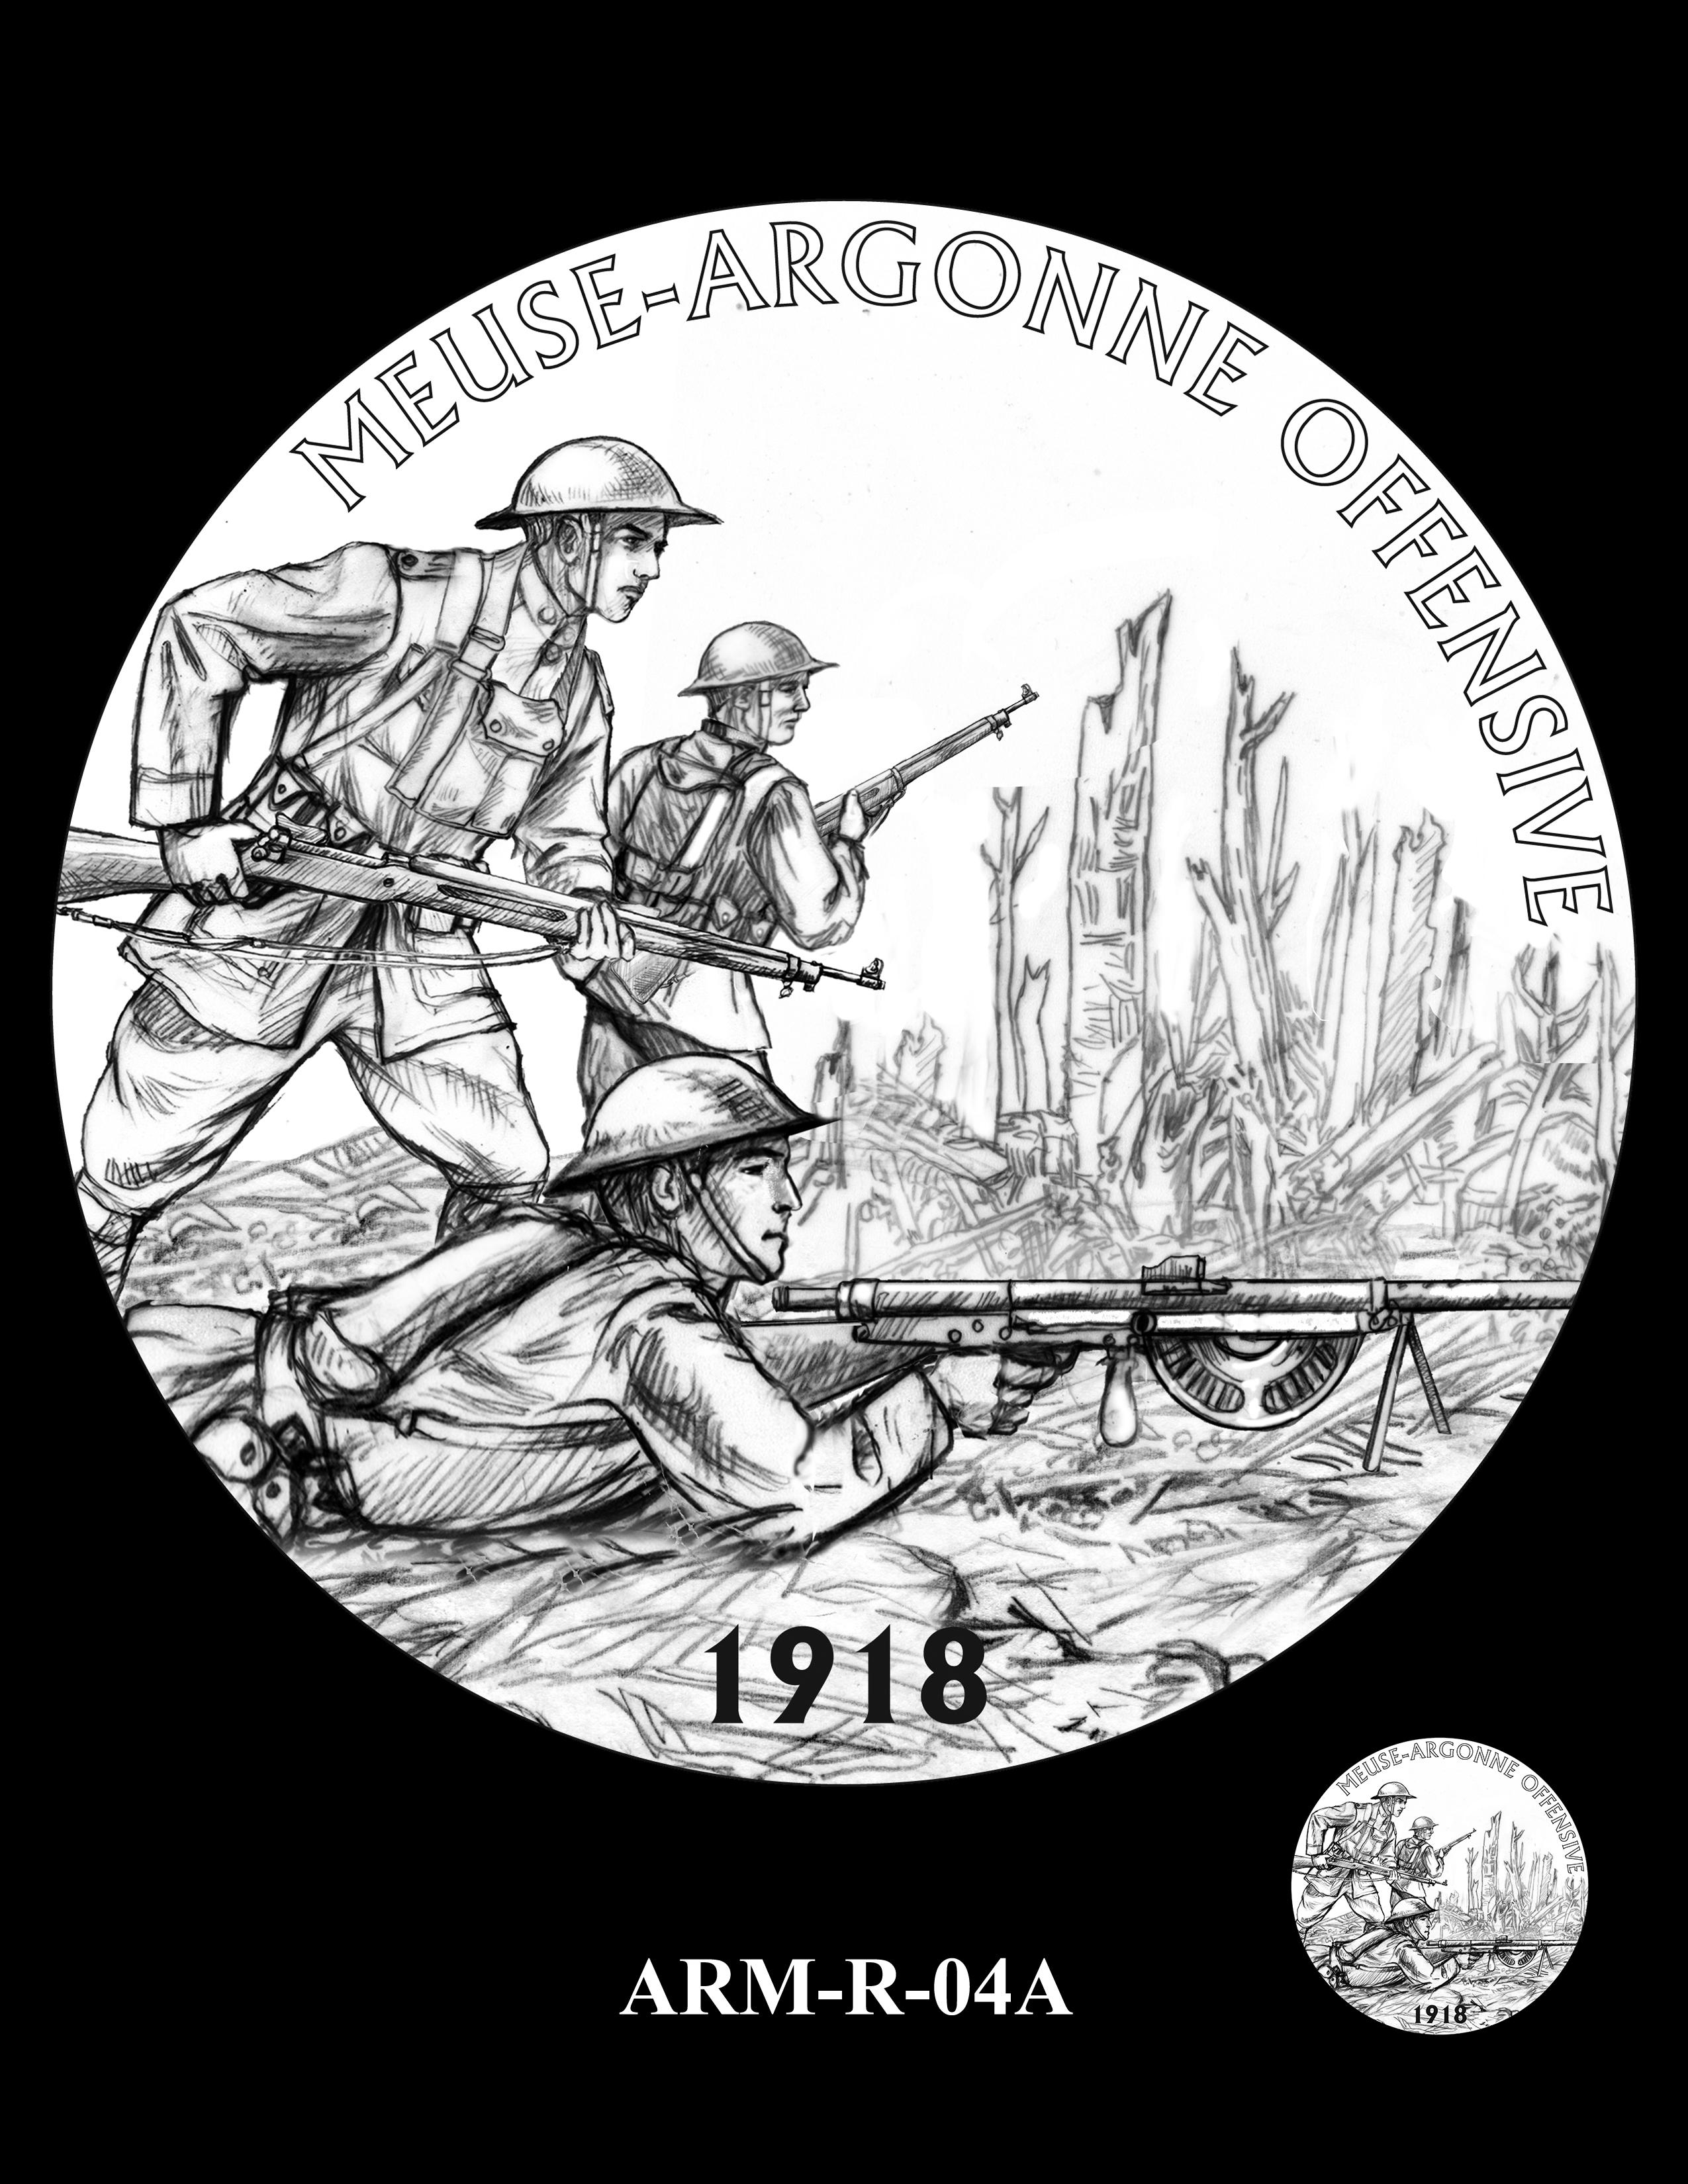 P1-ARM-R-04a --2018-World War I Silver Medals - Army